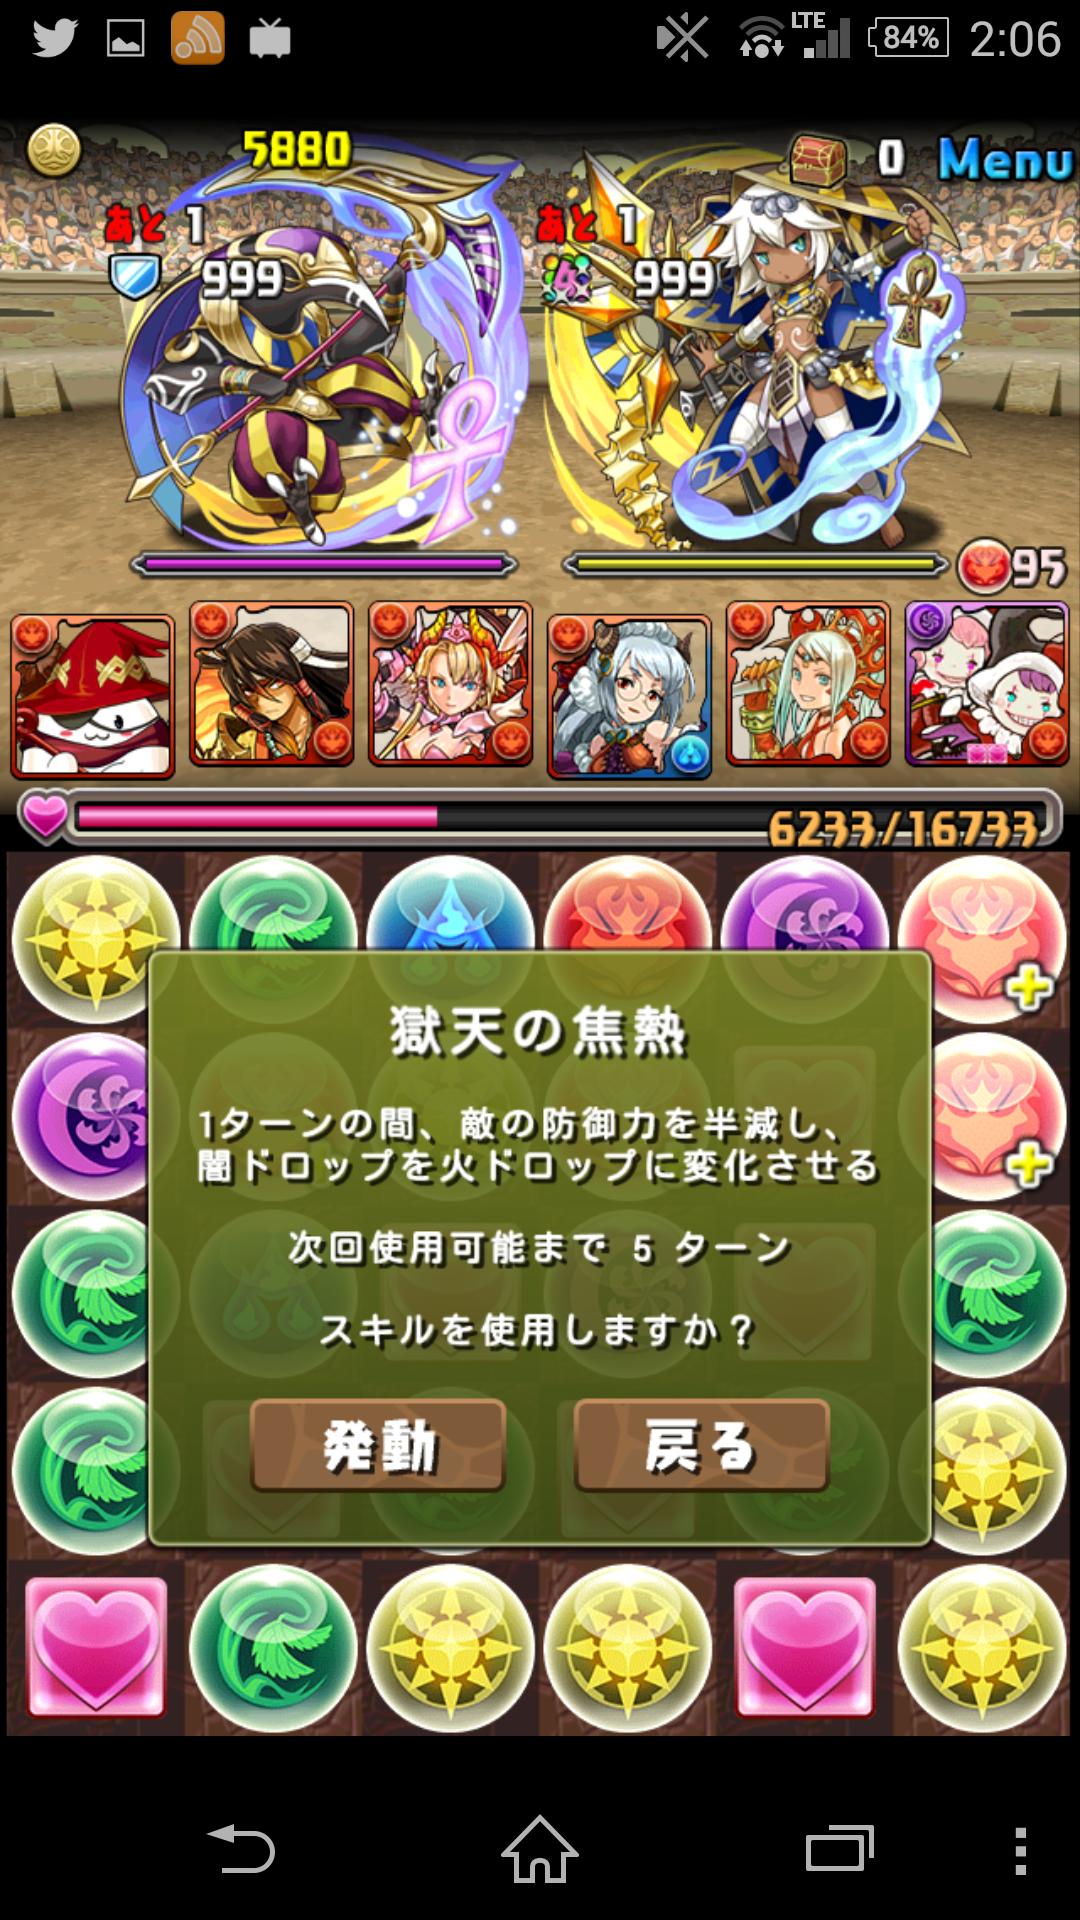 Screenshot_2015-03-12-02-06-22.png